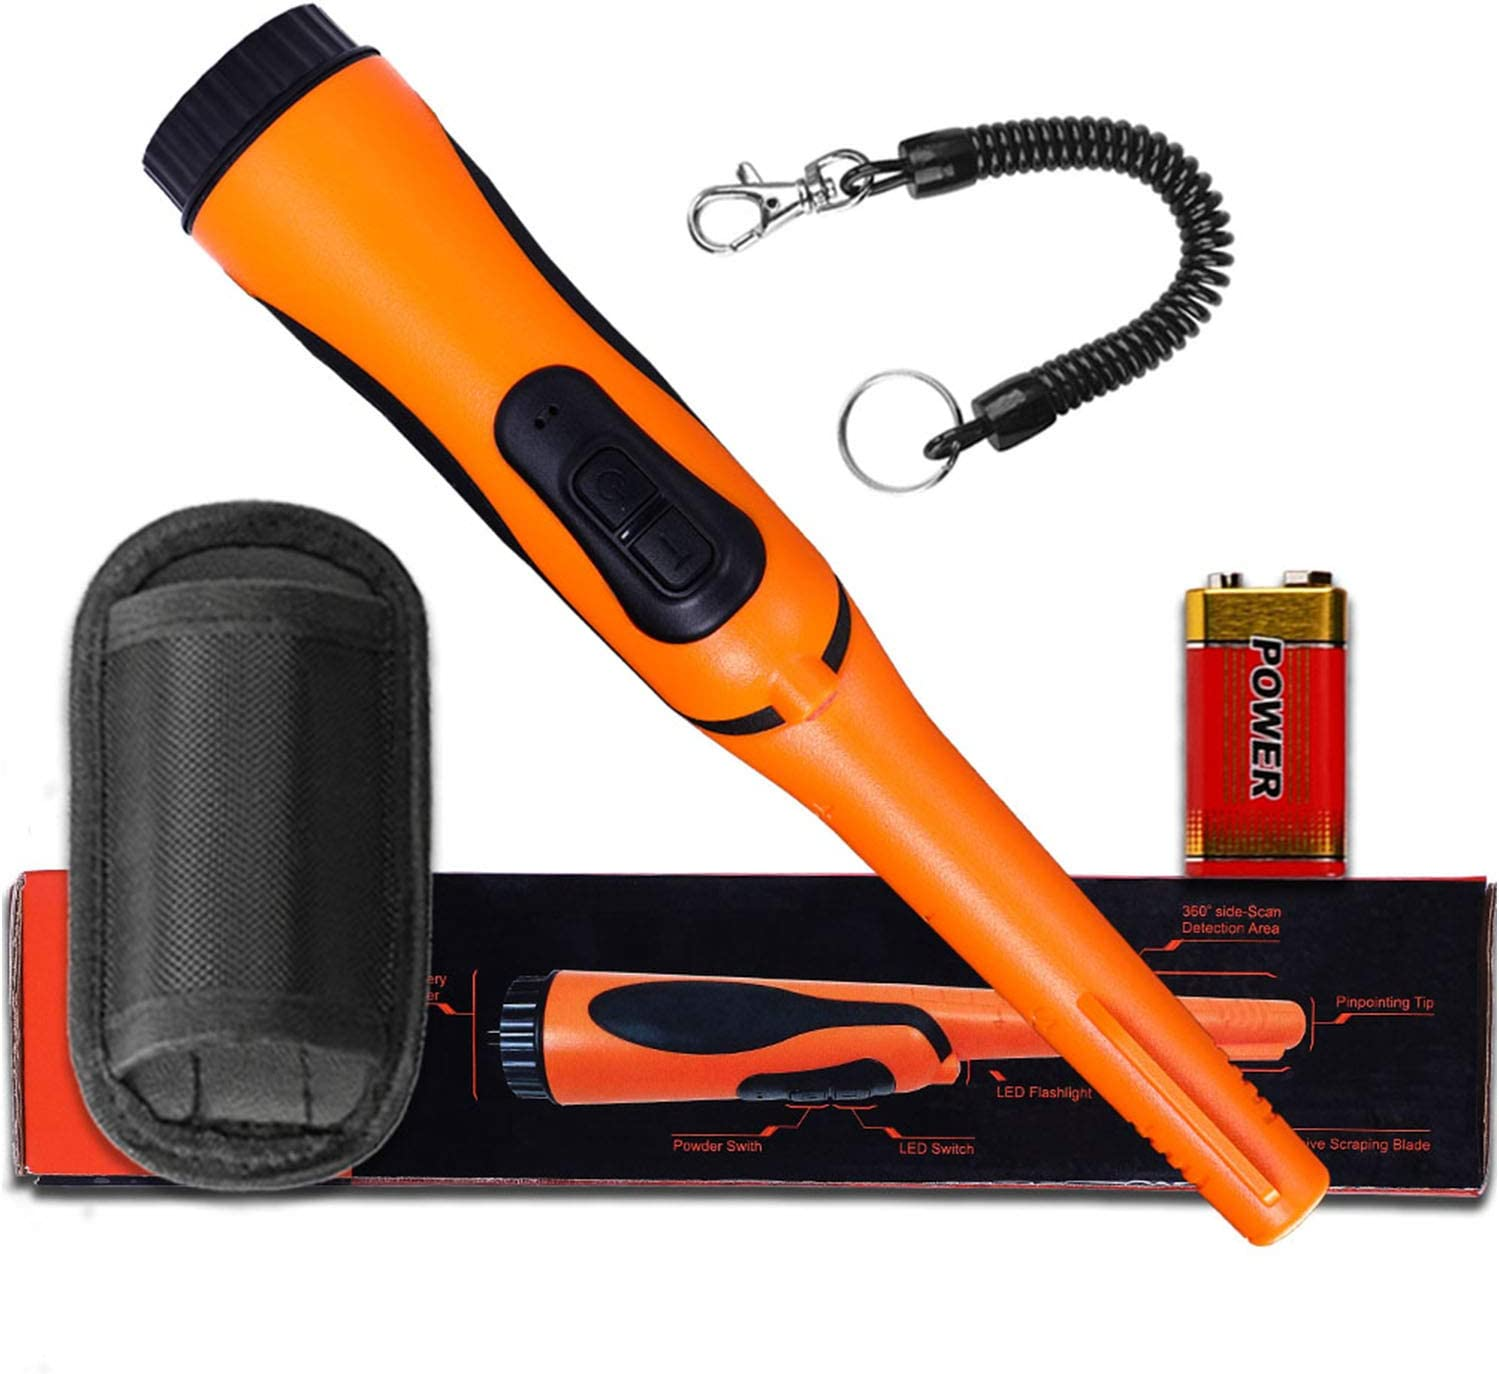 Metal Detector Detecting Pinpointer Flashlight Holder Mount Clip Clamp BODJF